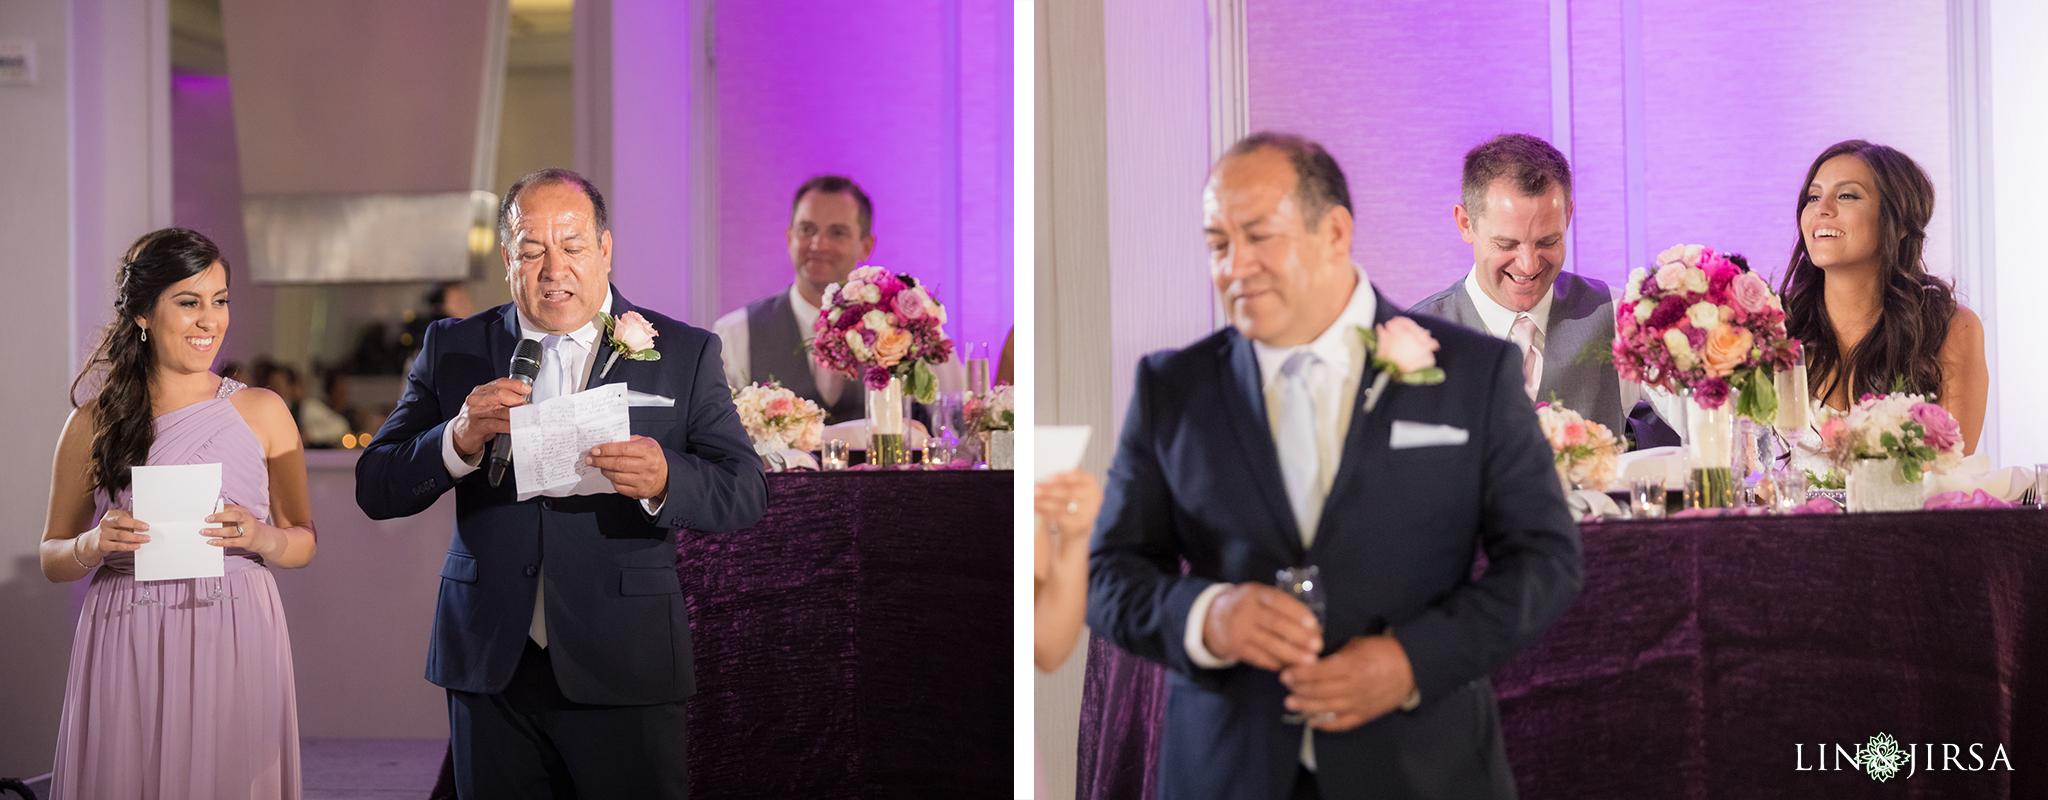 35-newport-beach-marriott-wedding-photography